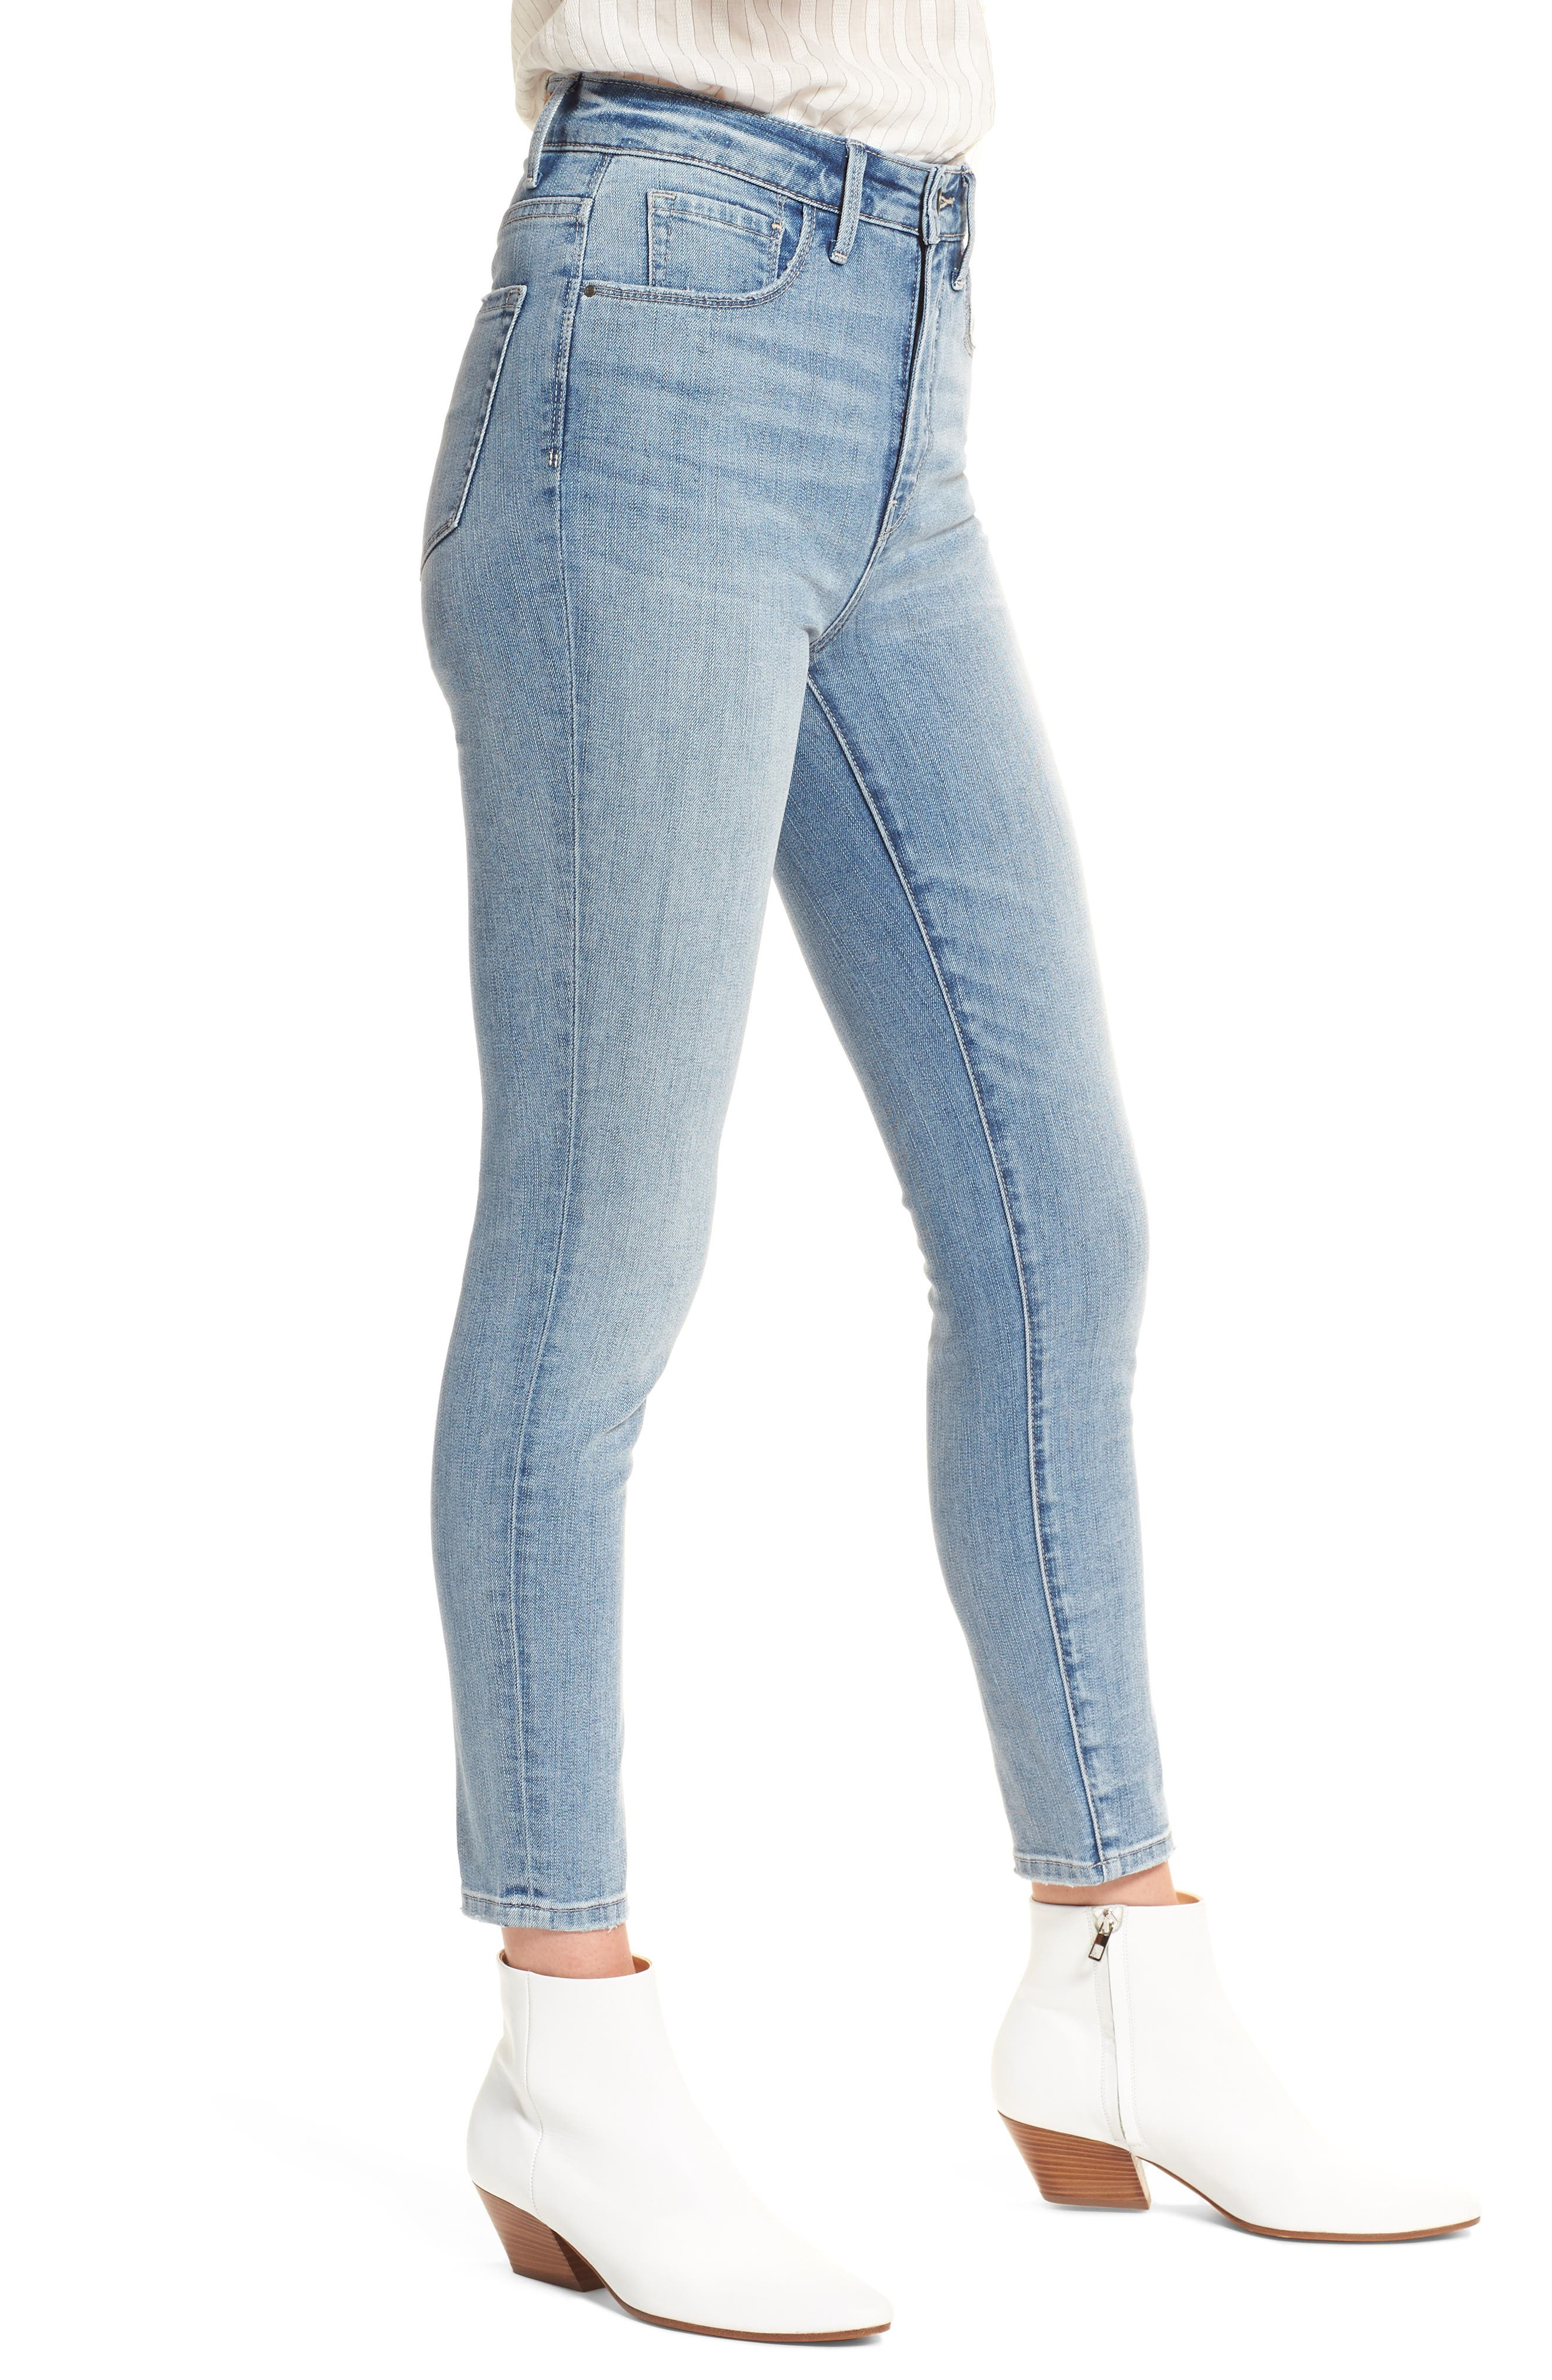 Alternate Image 3  - Treasure & Bond Charity High Waist Crop Skinny Jeans (Rain Extra Light Worn)